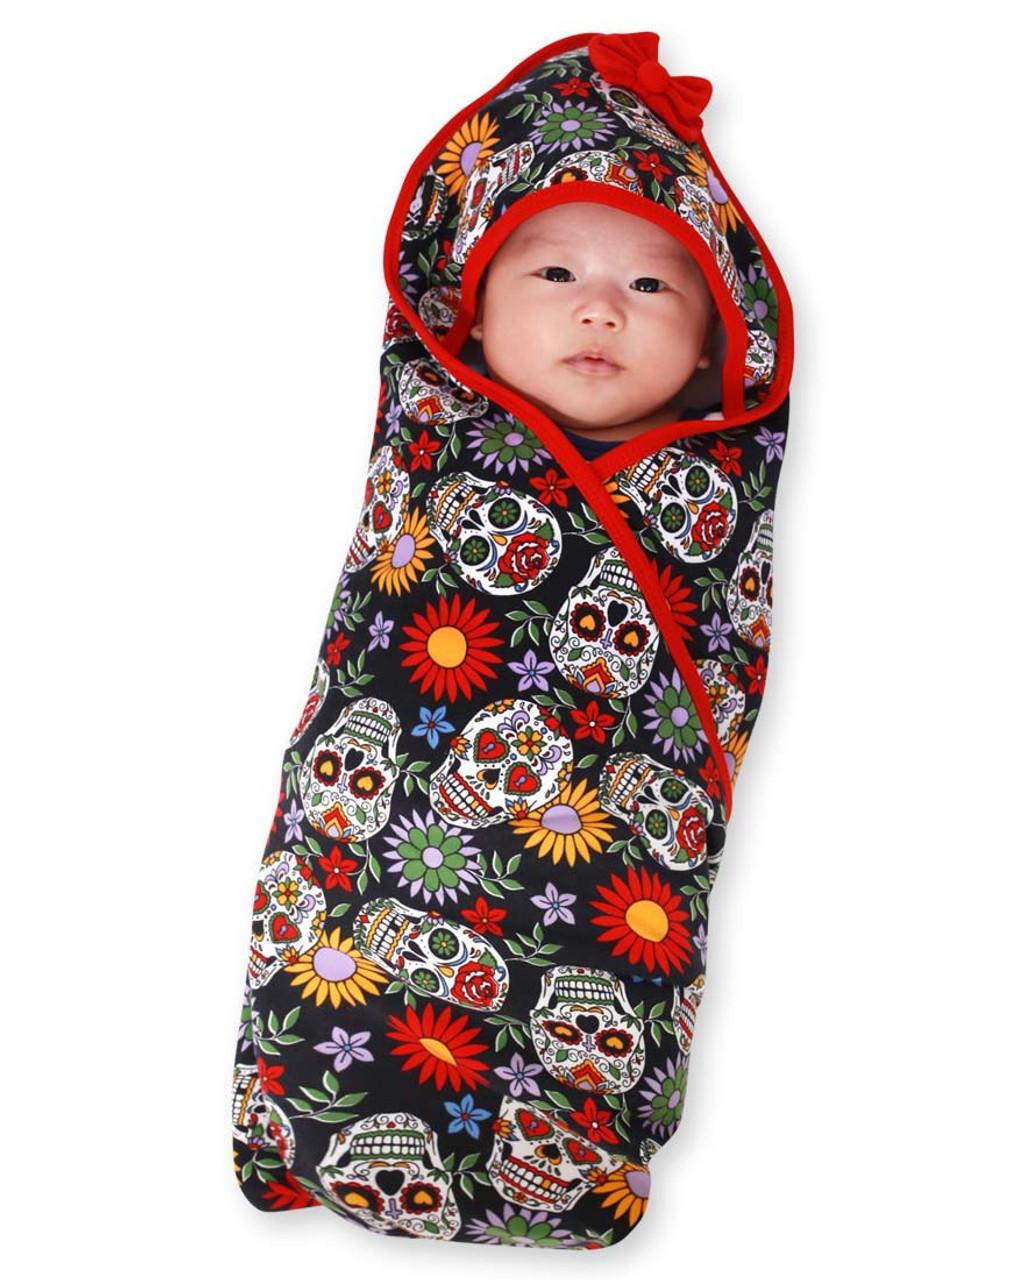 Six Bunnies Sugar Skulls Baby Wrap Blanket Hooded Towel Wrap